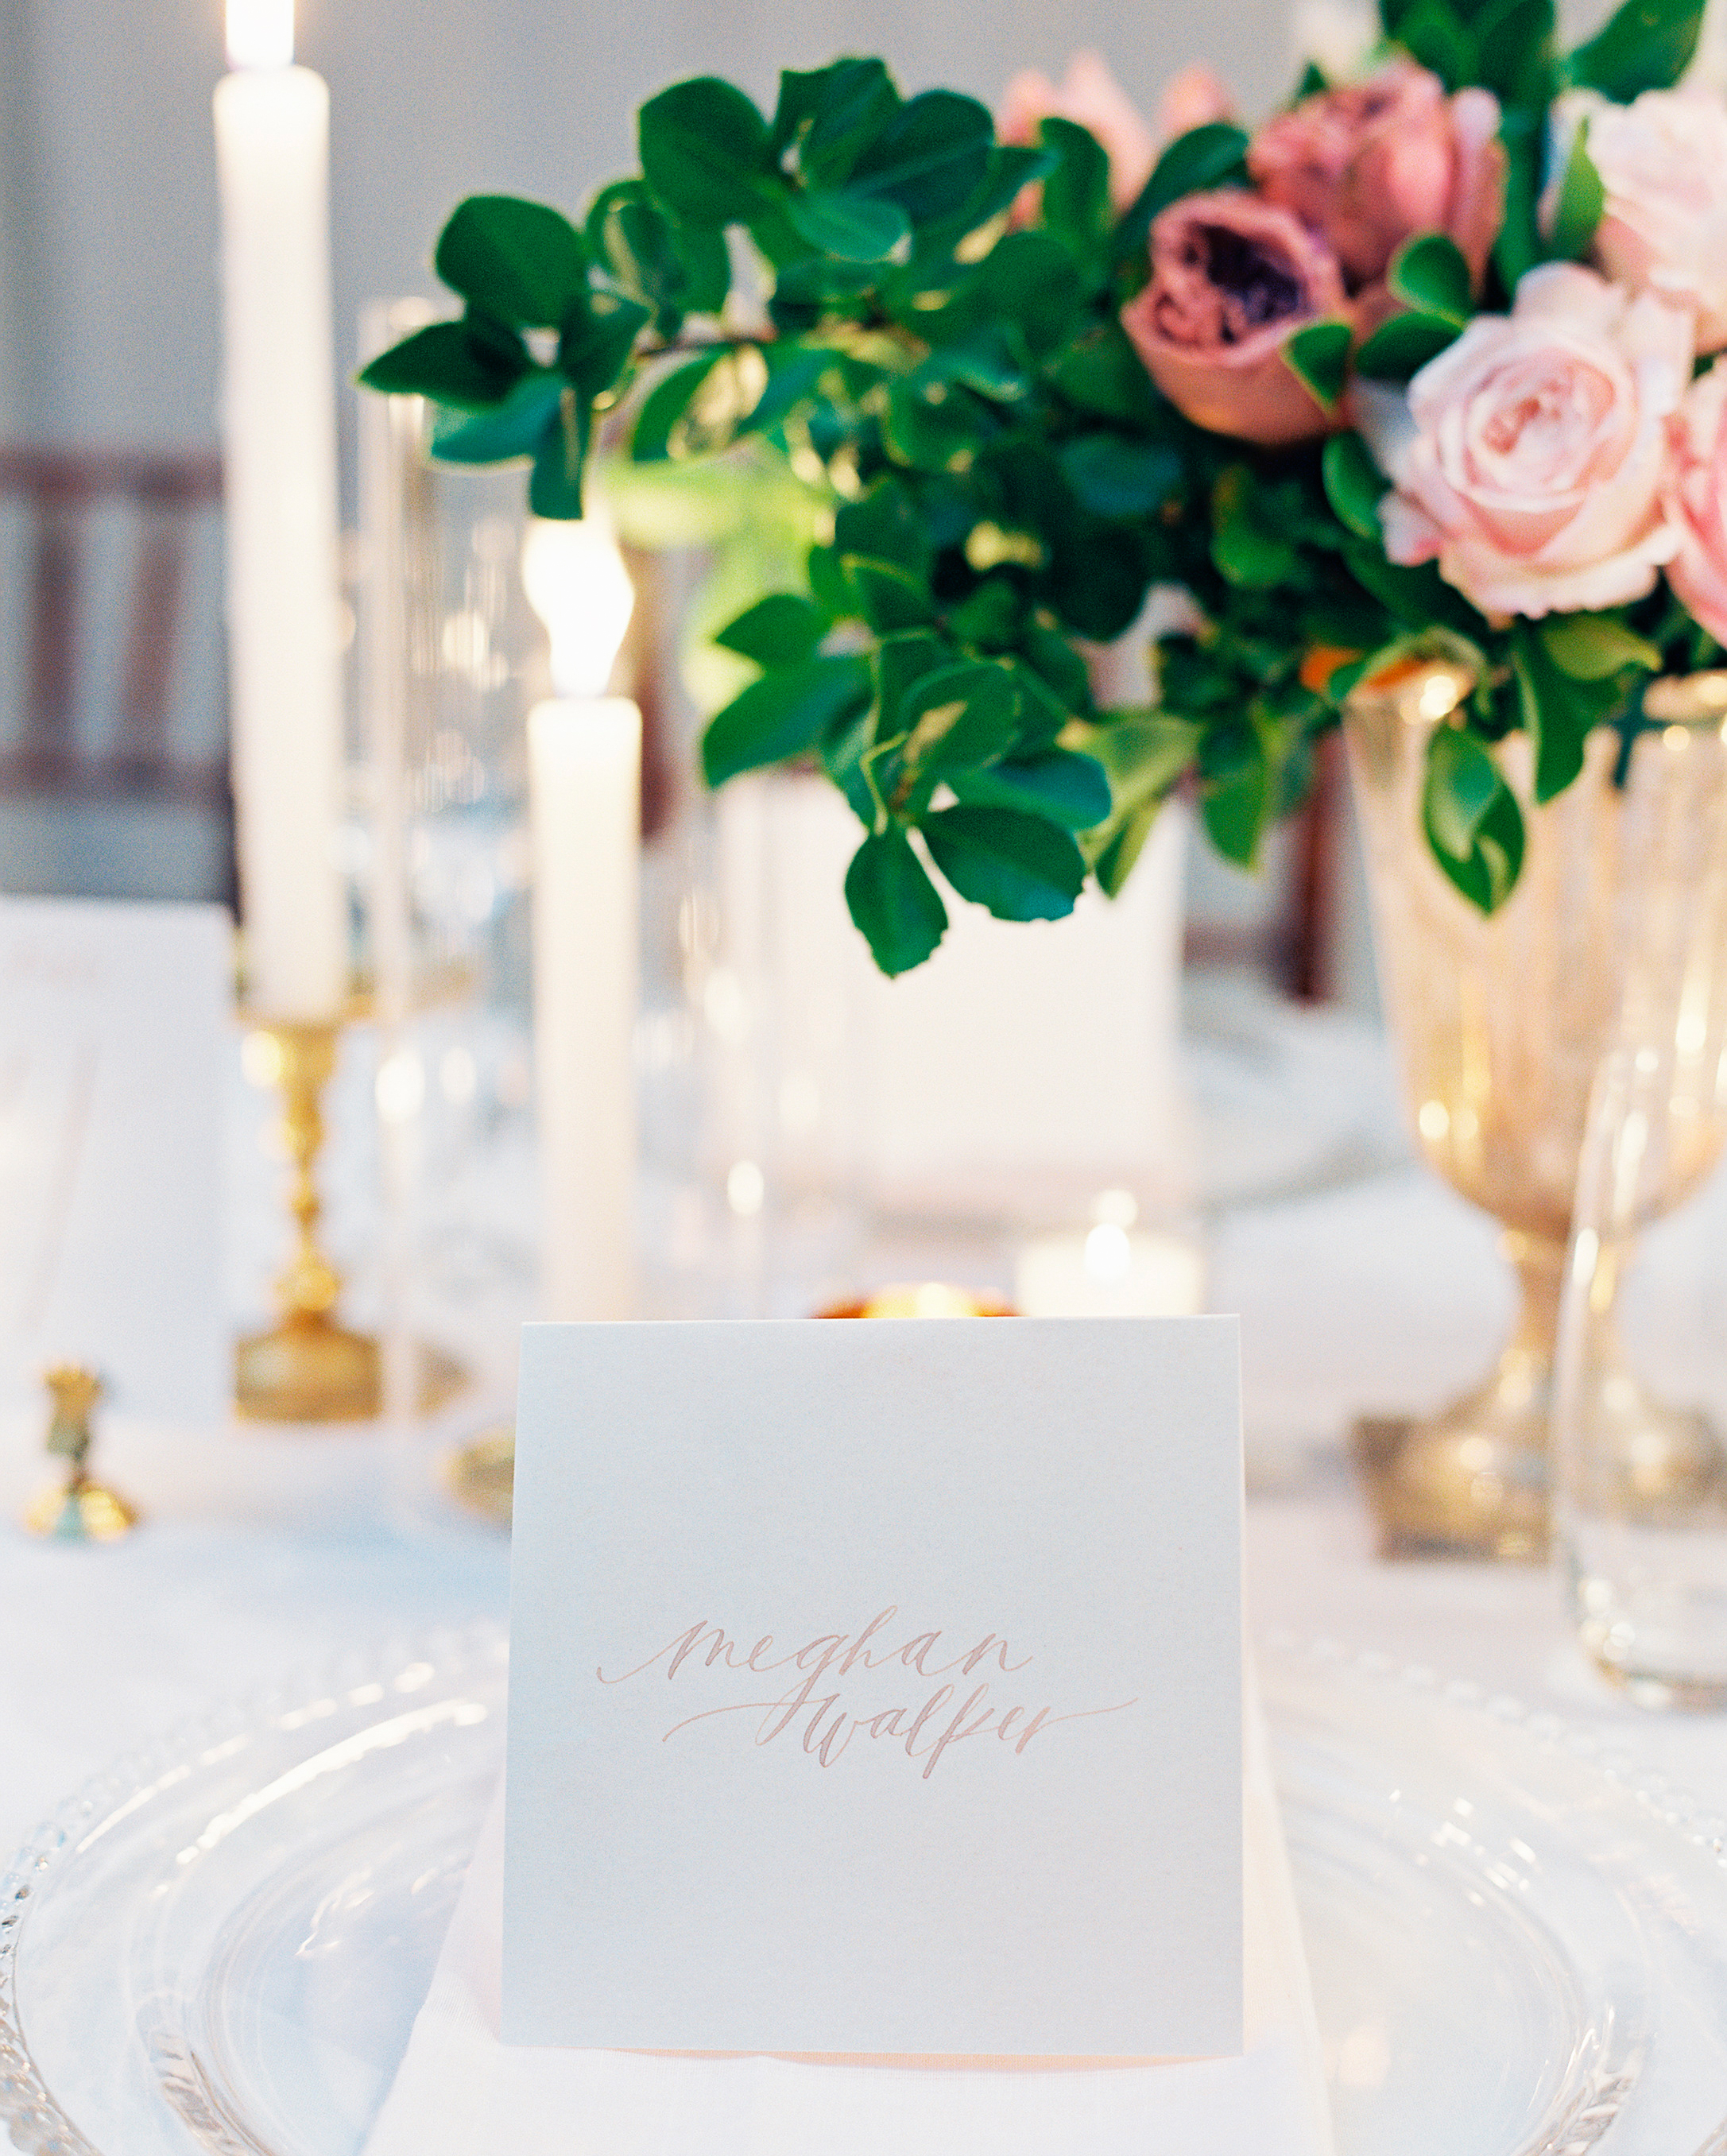 jemma-michael-wedding-placecard-002600007-s112110-0815.jpg